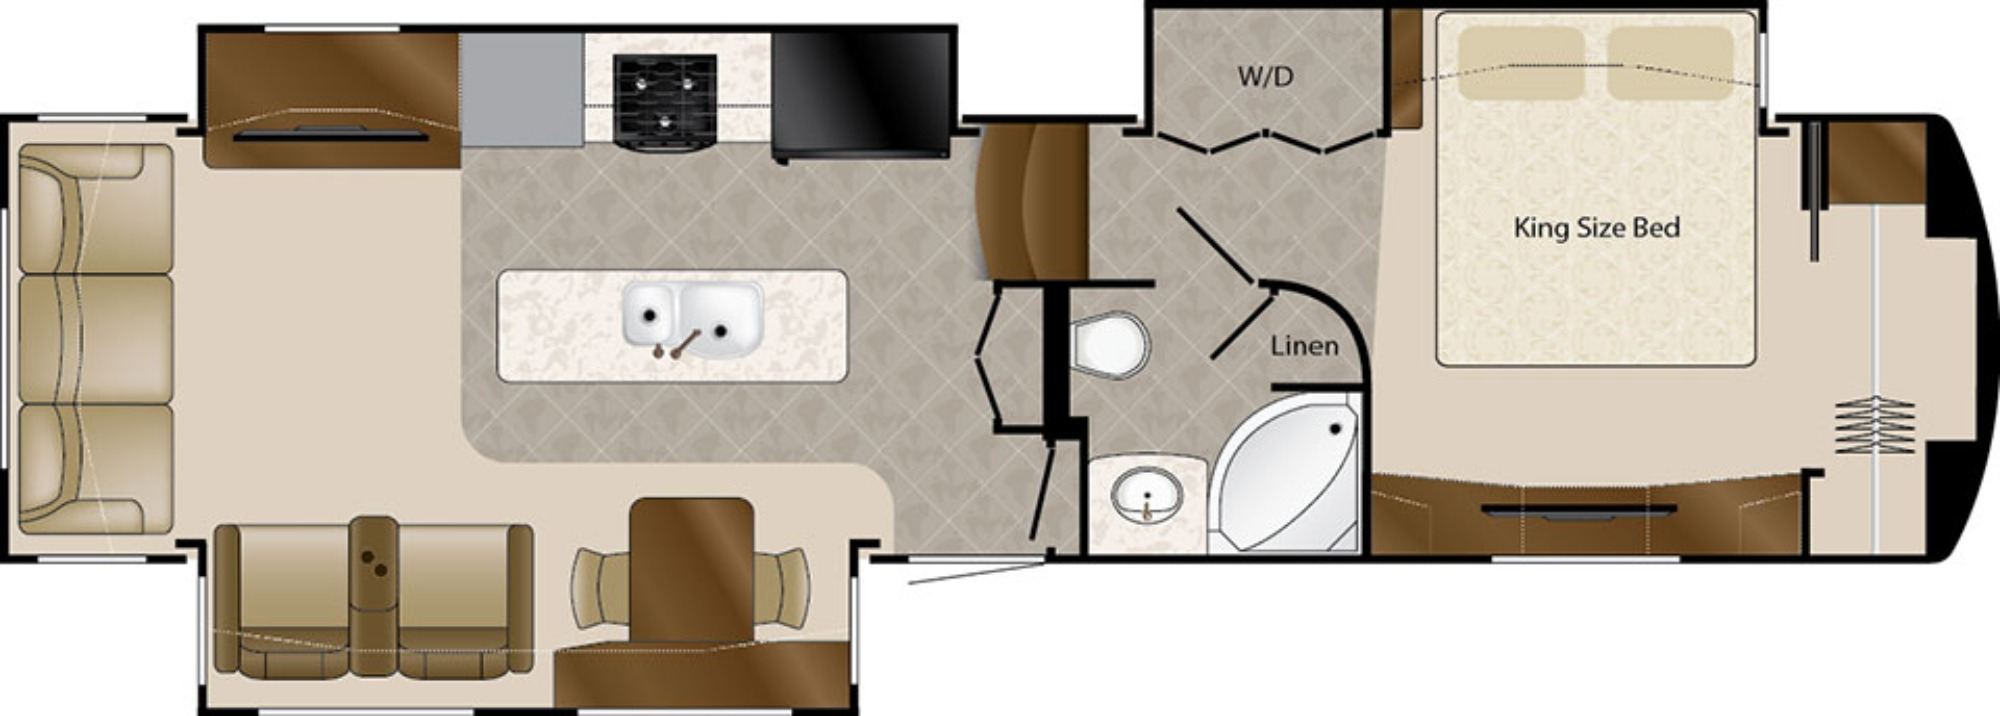 View Floor Plan for 2018 DRV LUXURY SUITES MOBILE SUITES 36RSSB3